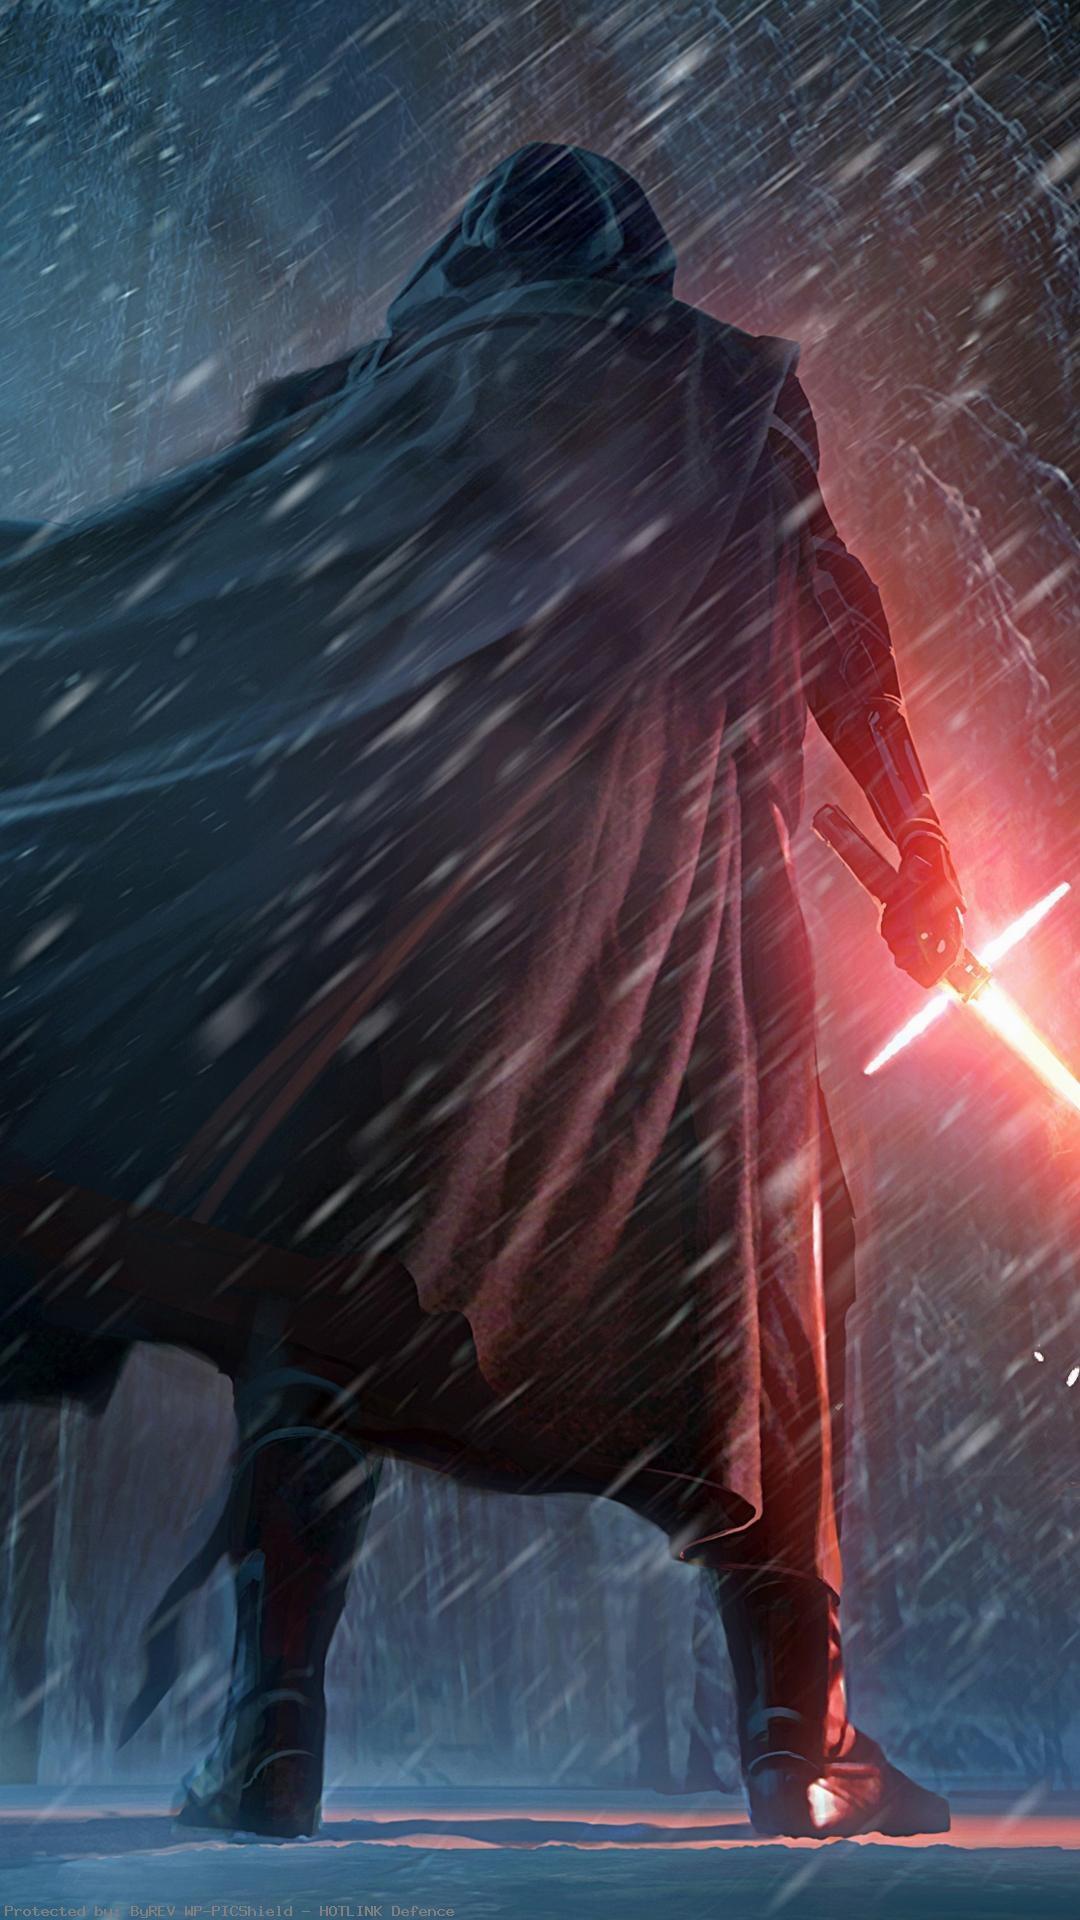 Star-Wars-The-Force-Awakens-Kylo-Ren-Snow-